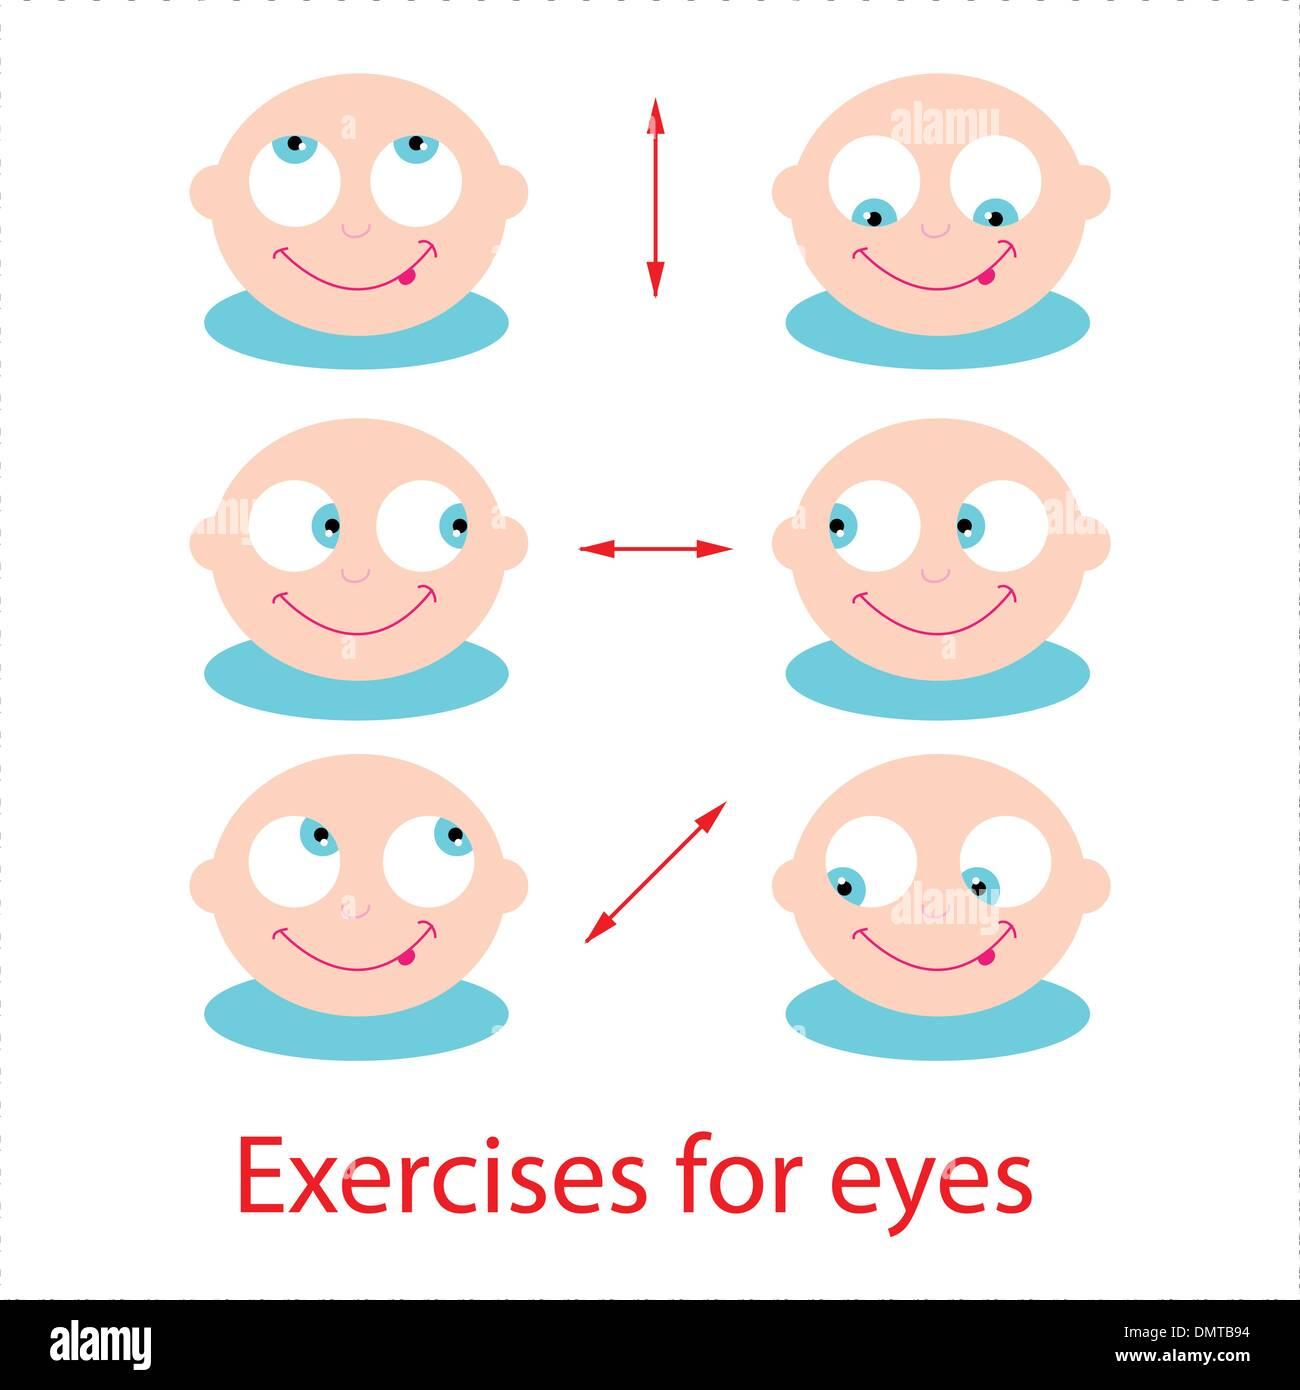 Optometrist Eye Sign Stockfotos & Optometrist Eye Sign Bilder ...